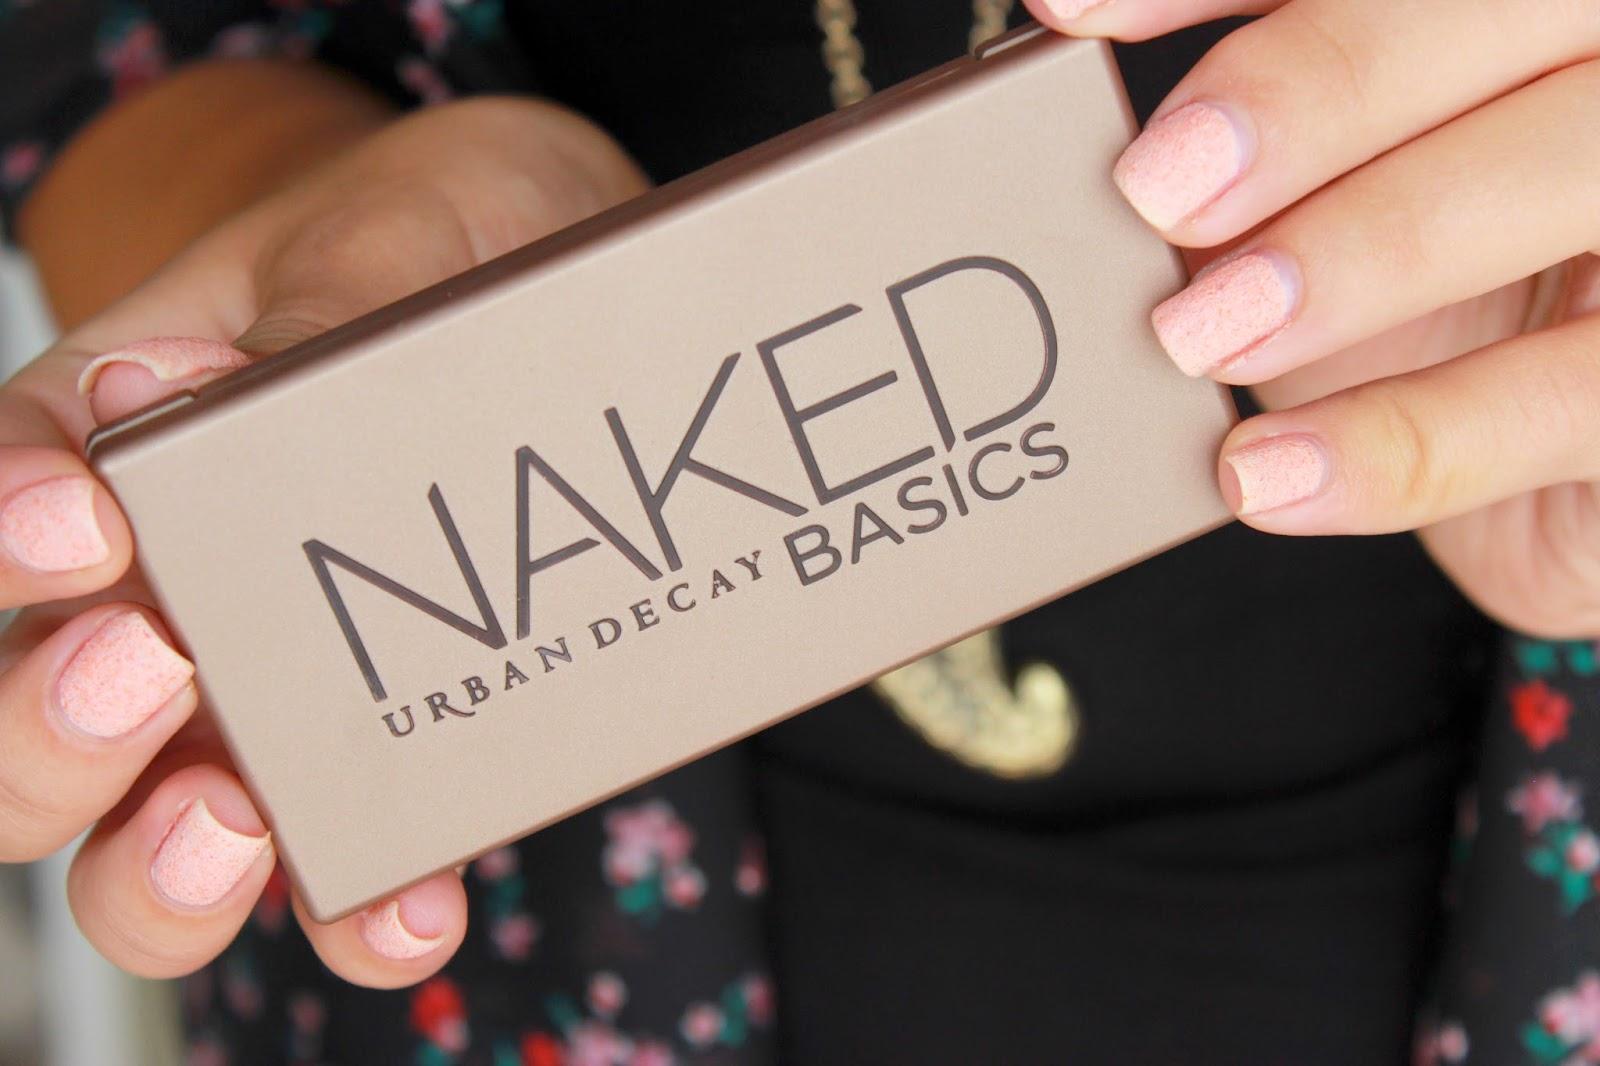 Naked Basics Urban Decay REVIEW